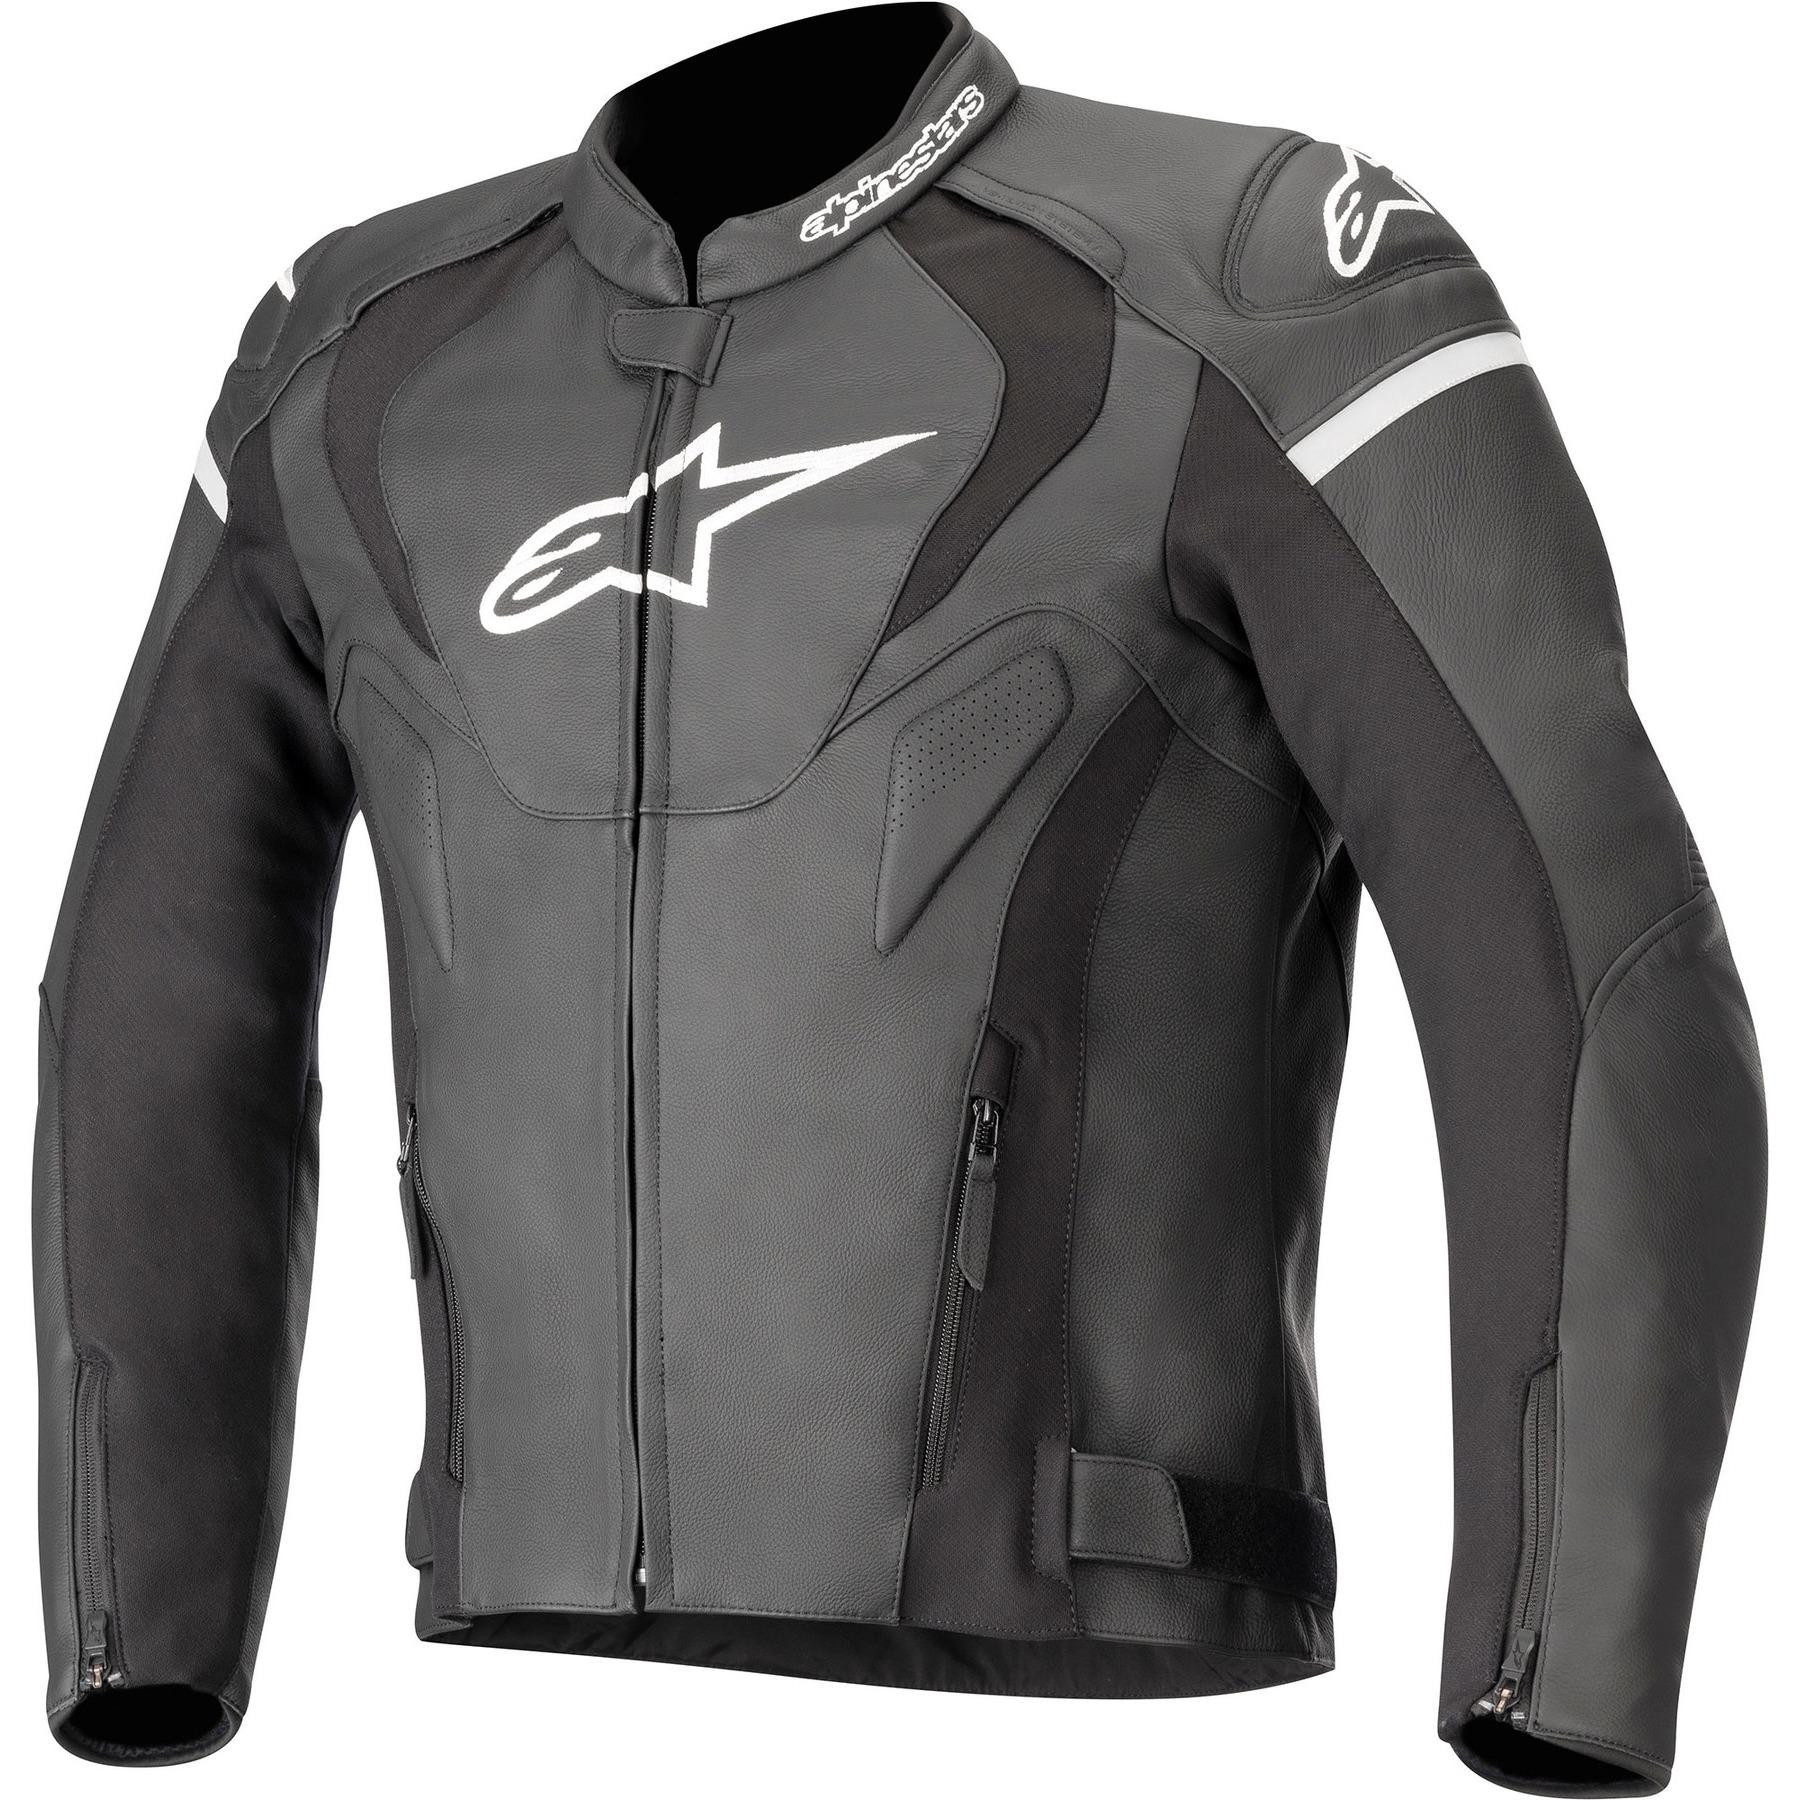 All Sizes Alpinestars Motorcycle Racing Rain Jacket